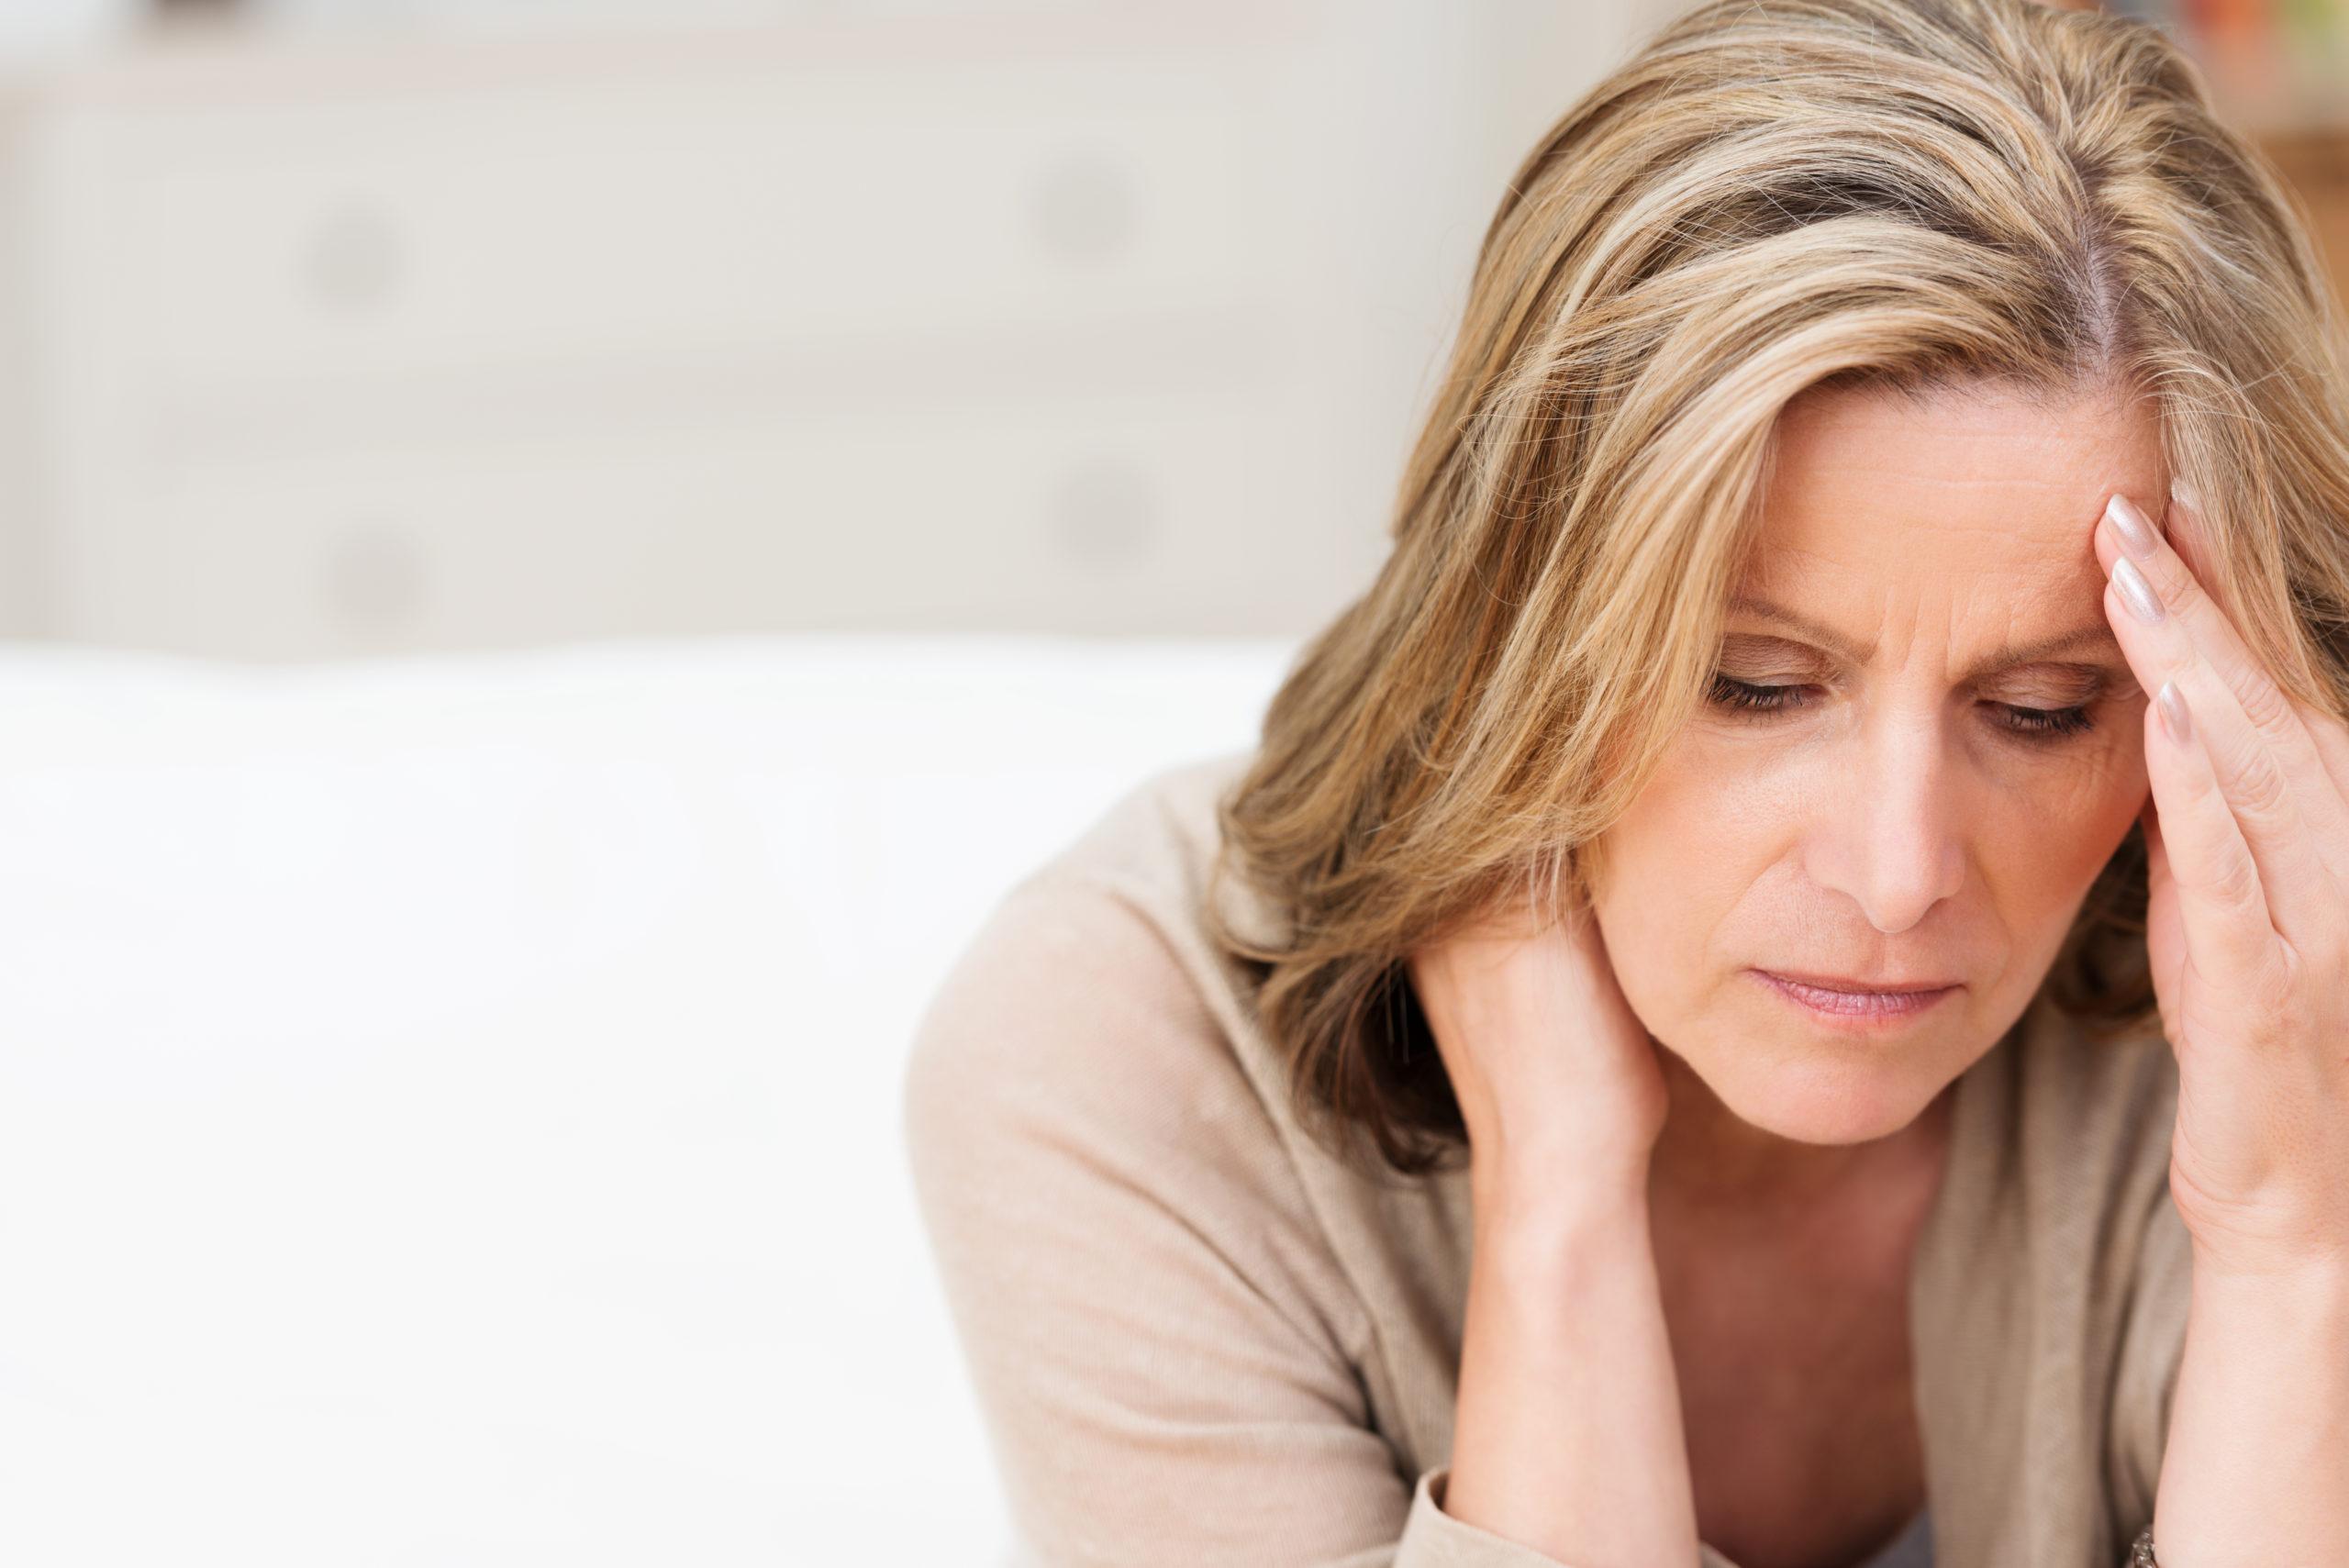 woman-suffering-stress-headache-grimacing-pain-192268697